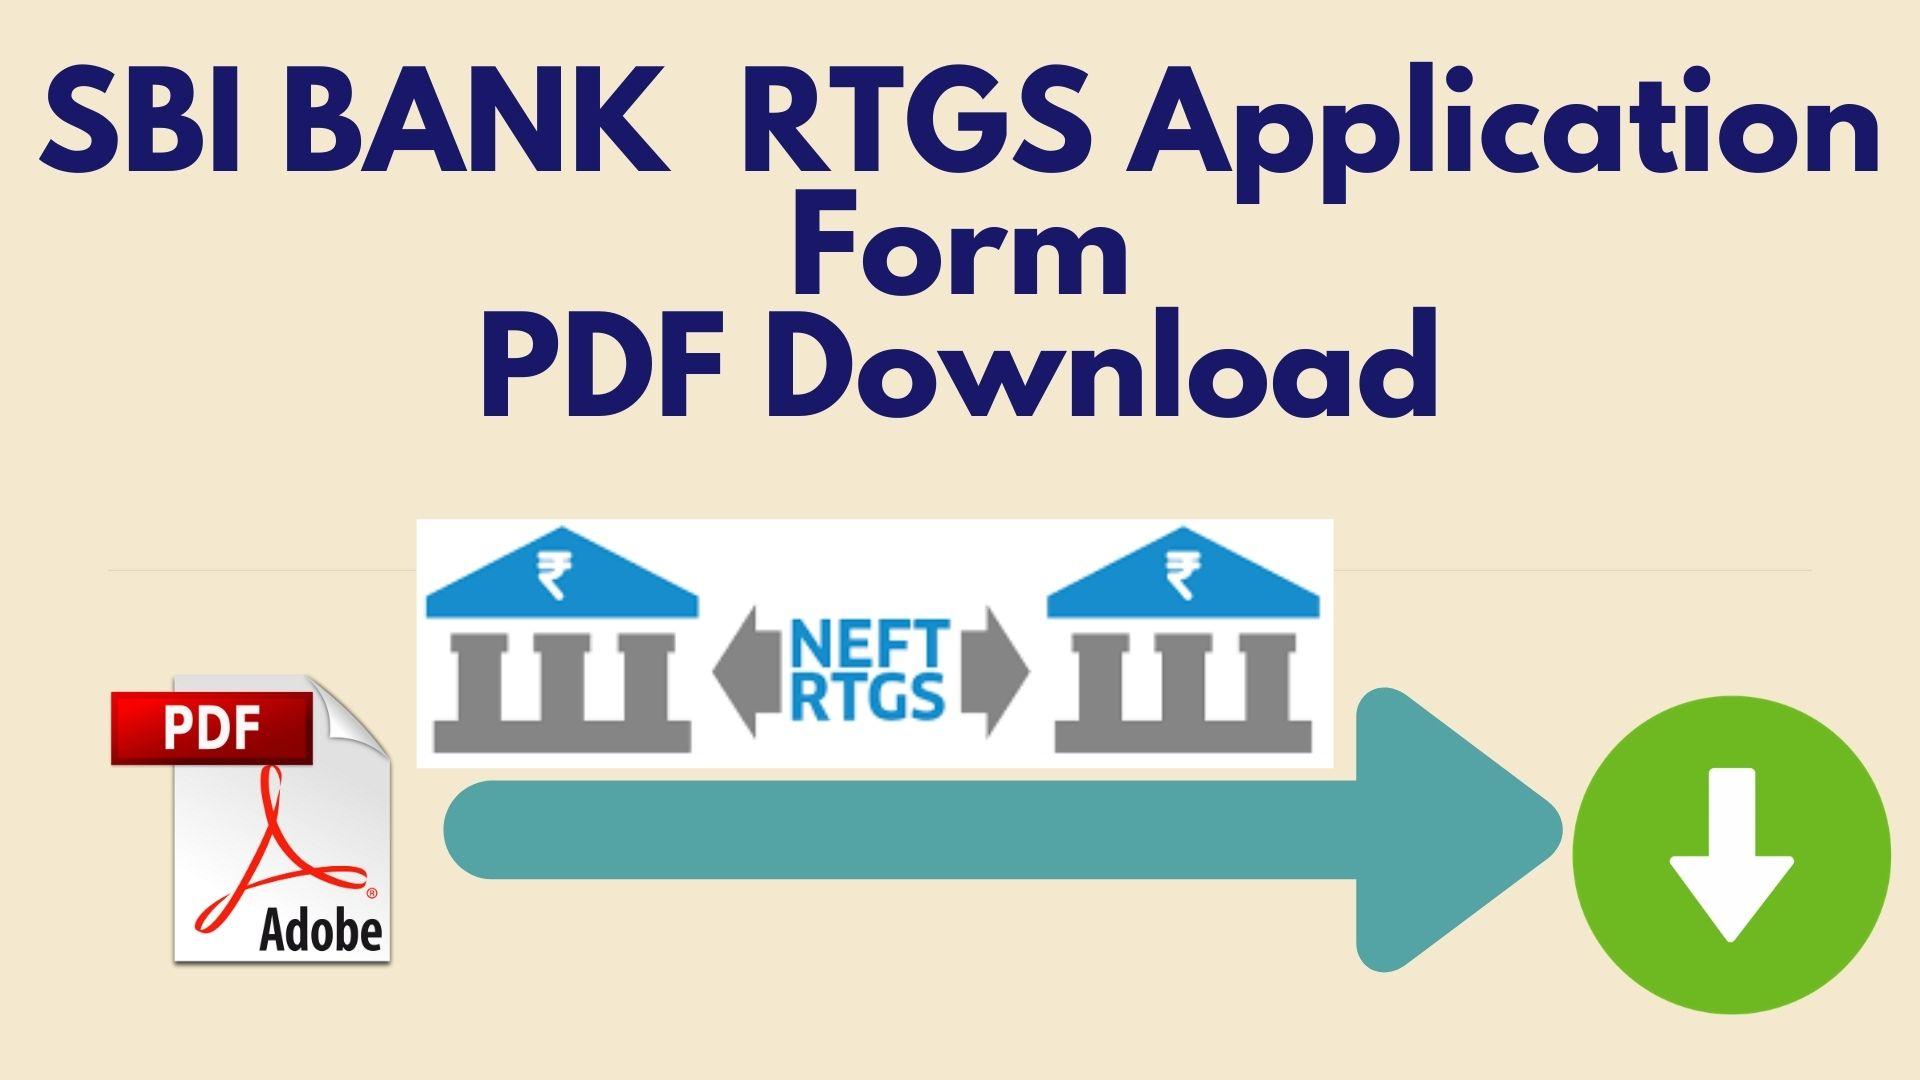 SBI BANK  RTGS Application Form PDF Download